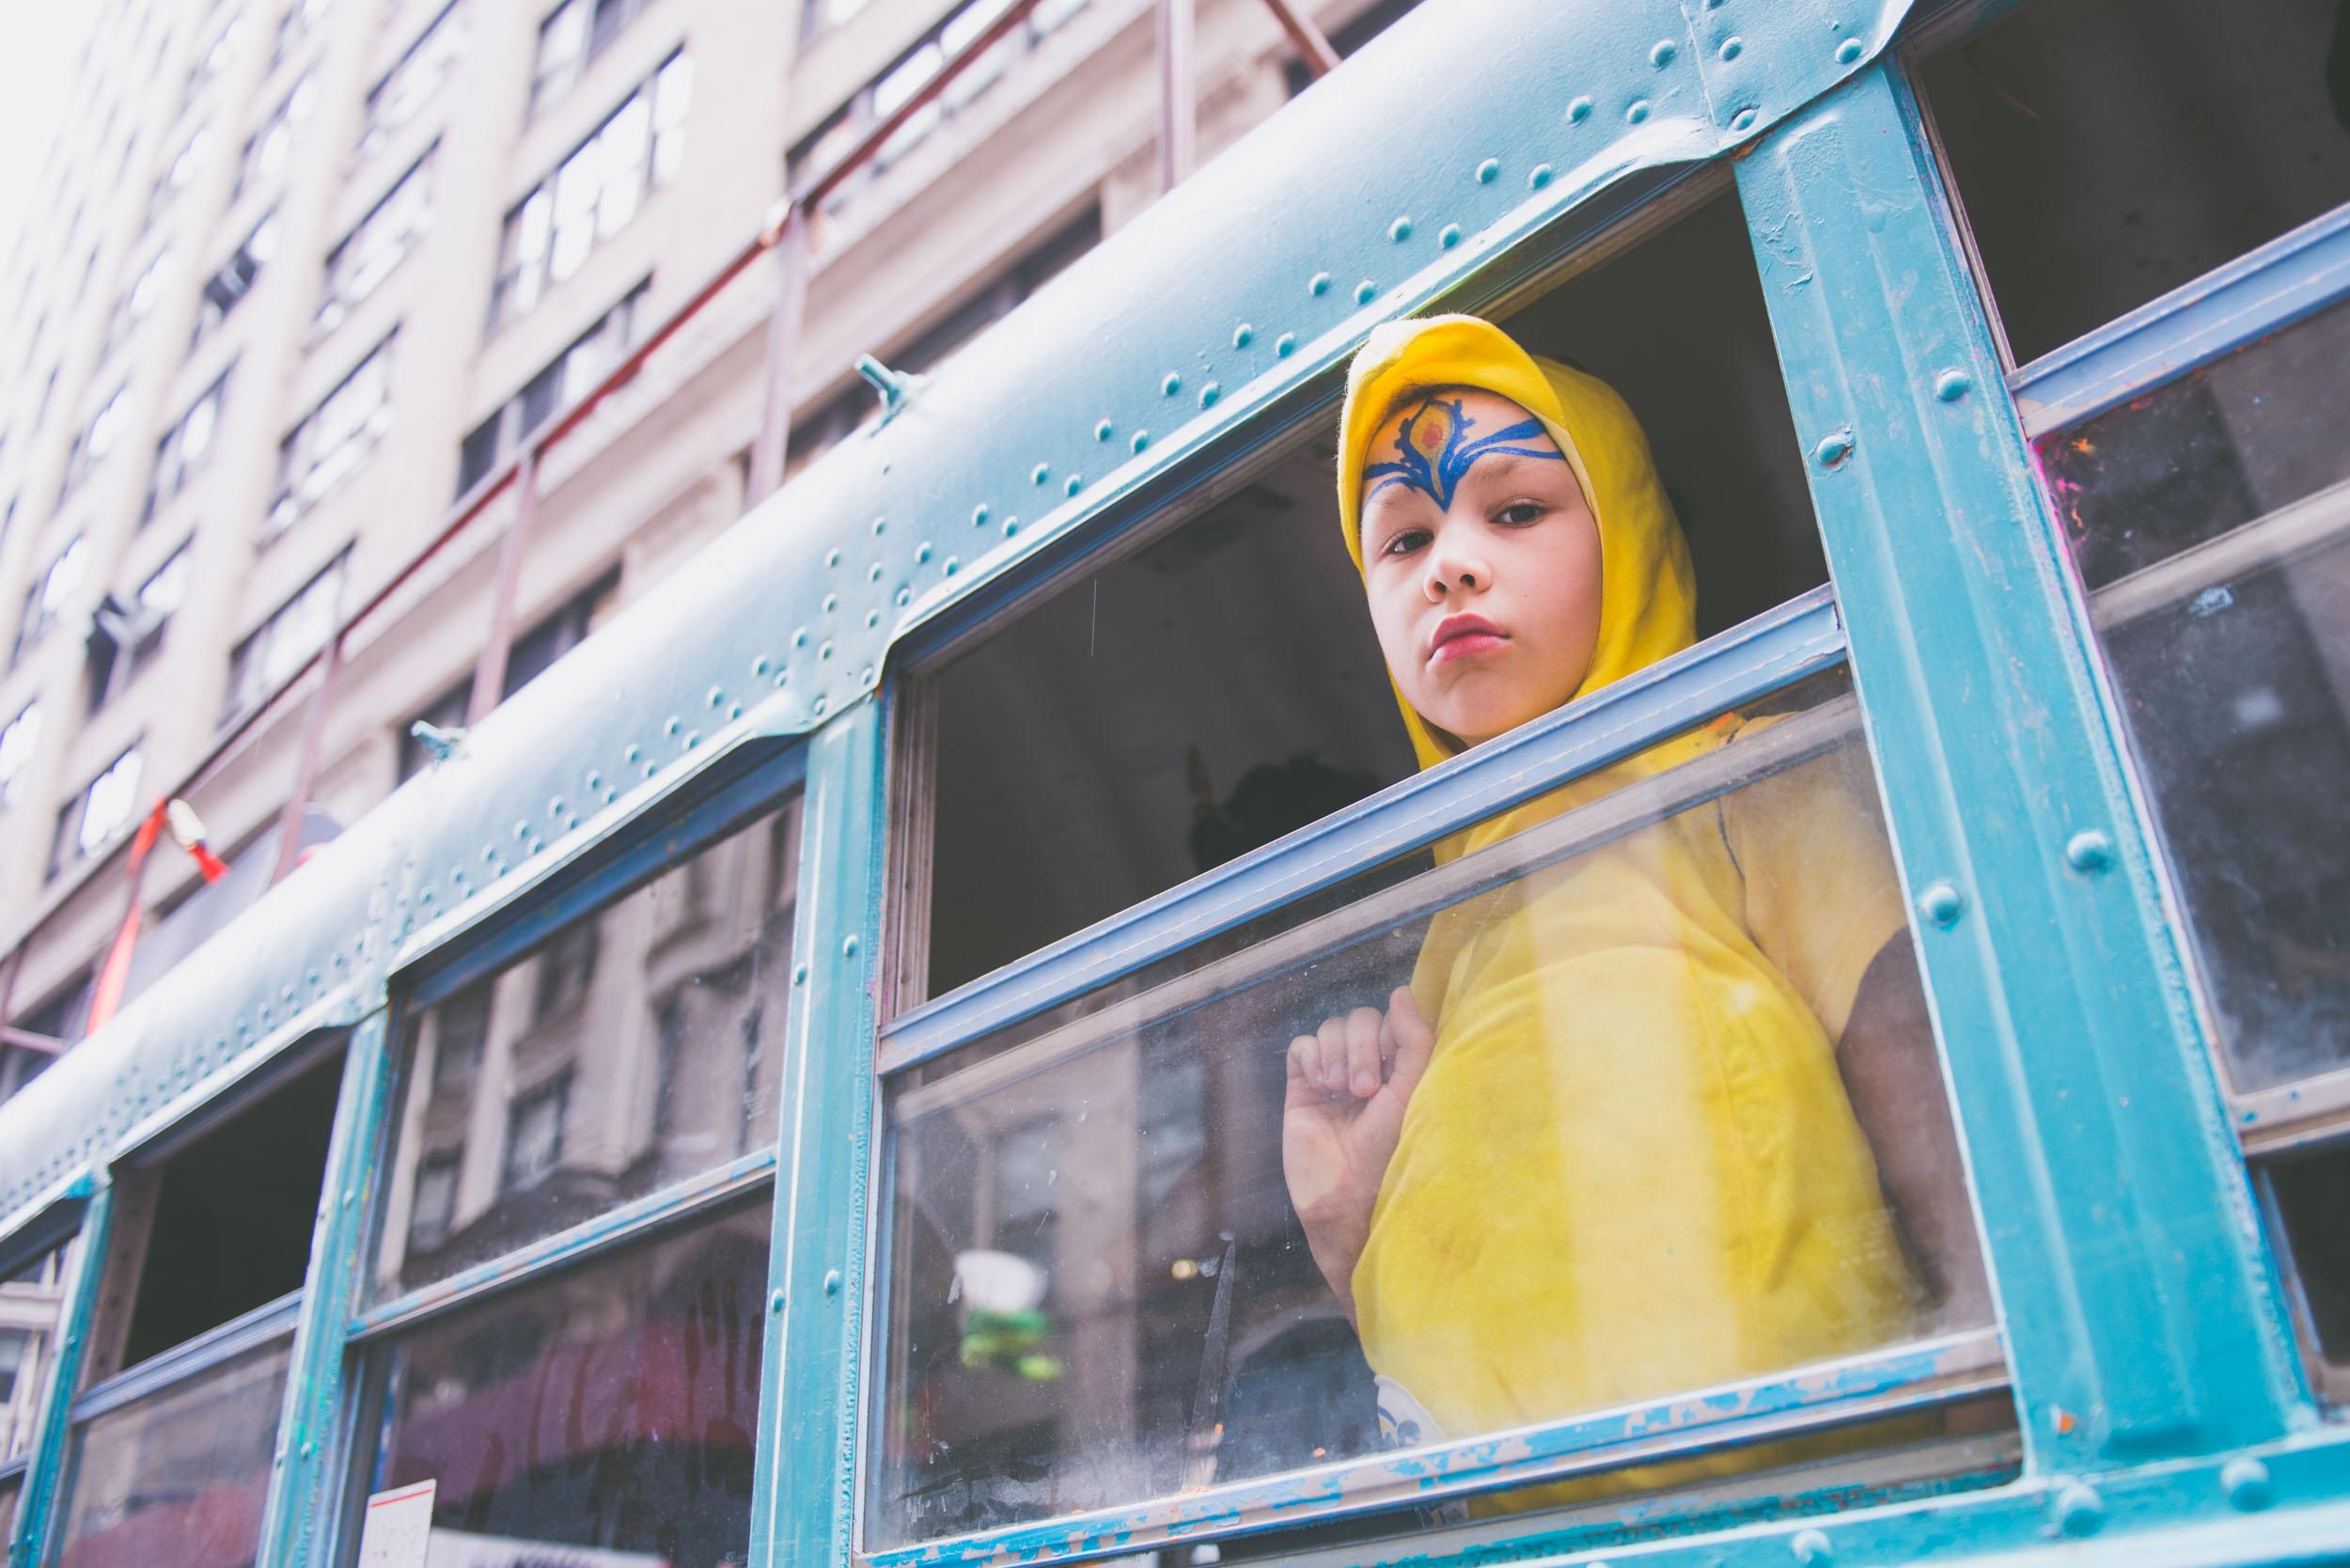 Boy at bus window - Current events - Photo credit Nicola Bailey.jpg